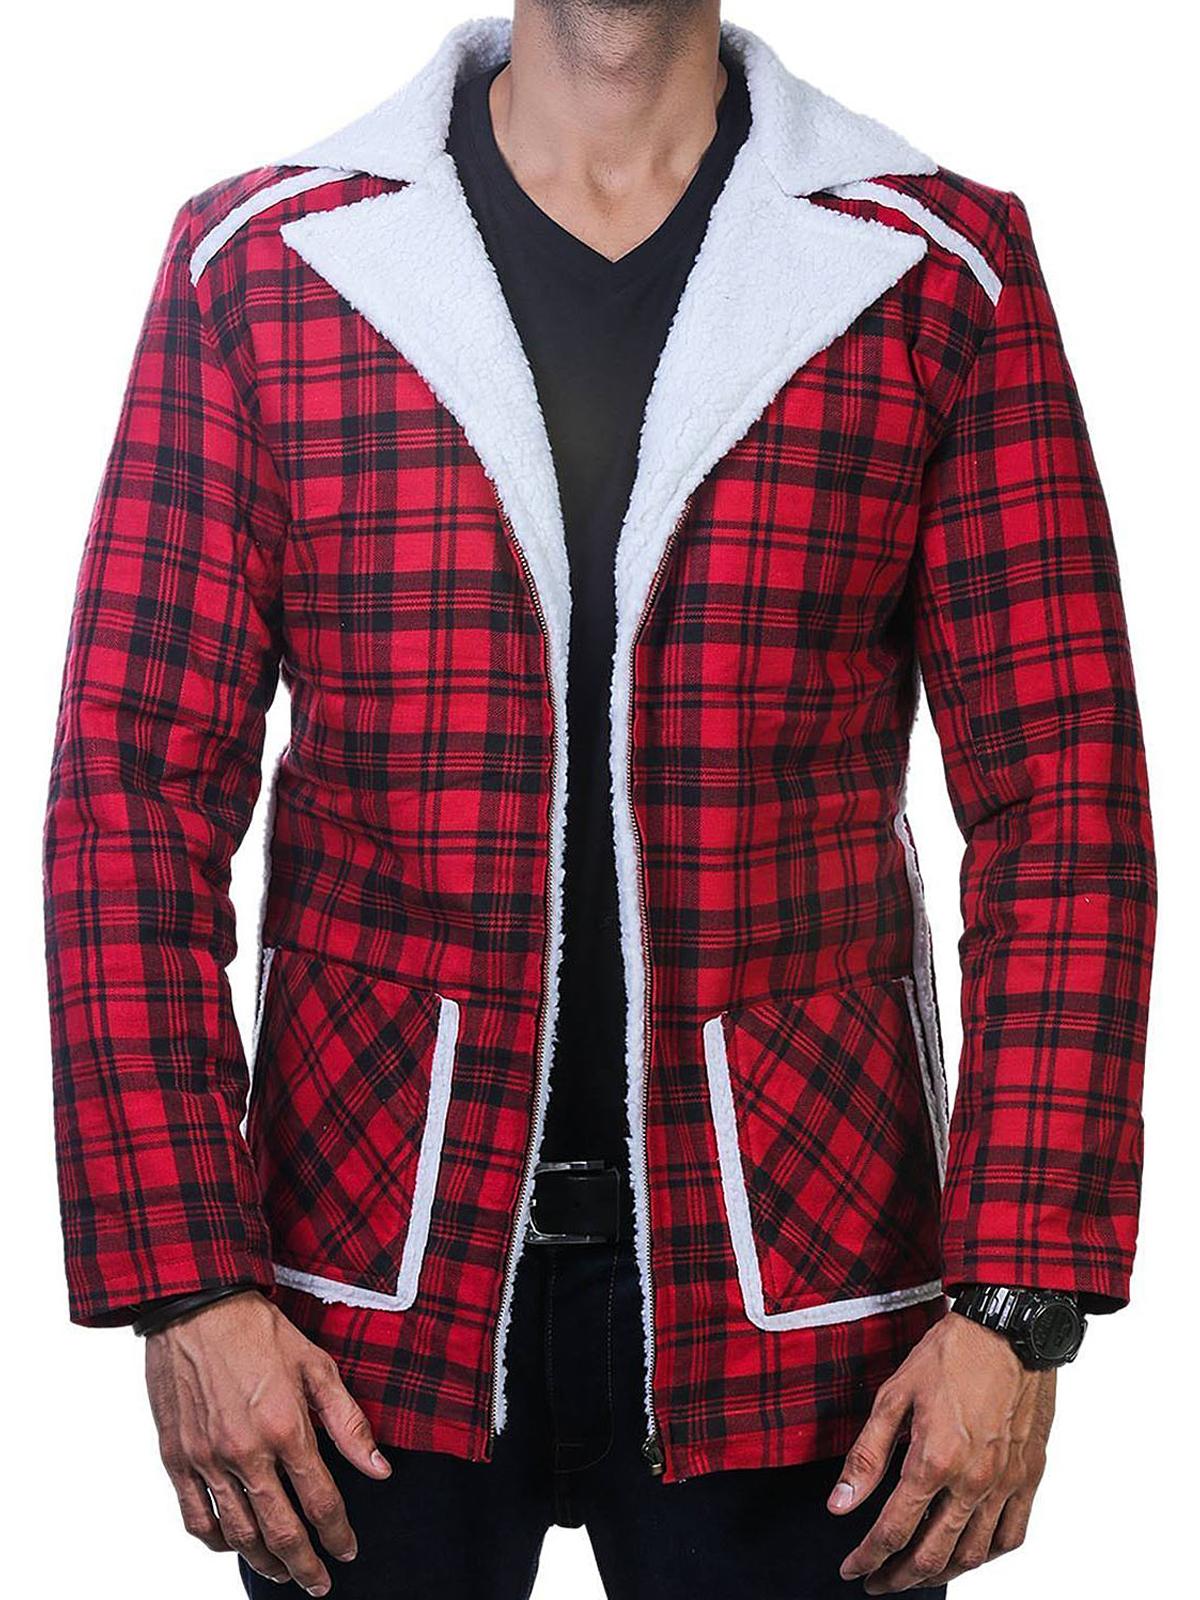 E:\Social Media\FZ Merchandise\Product Pictures\Deadpool Shearling fur Jacket